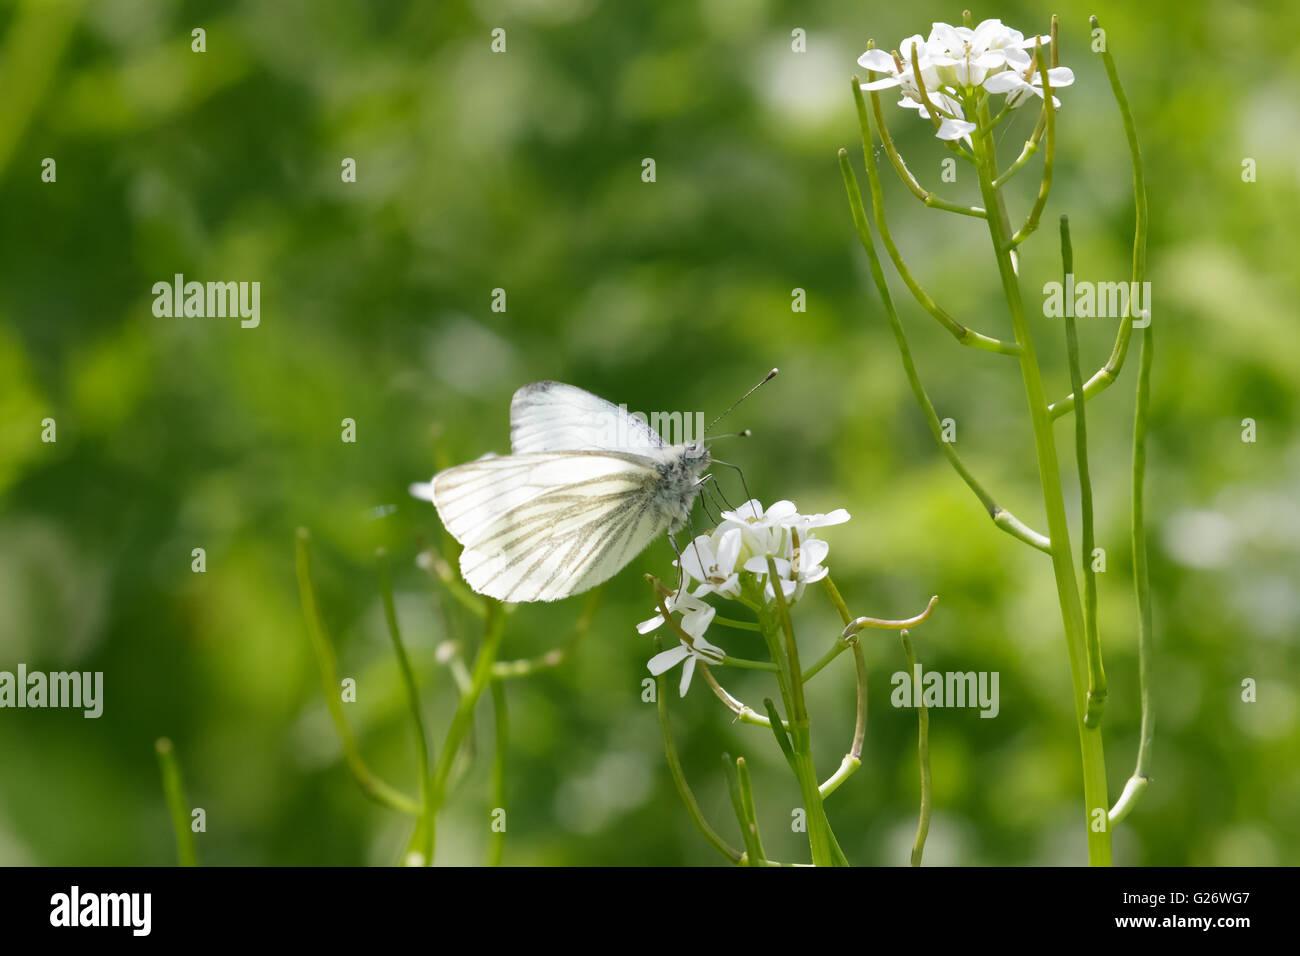 Green-veined white (Pieris napi) feeding on nectar of a white flower. - Stock Image